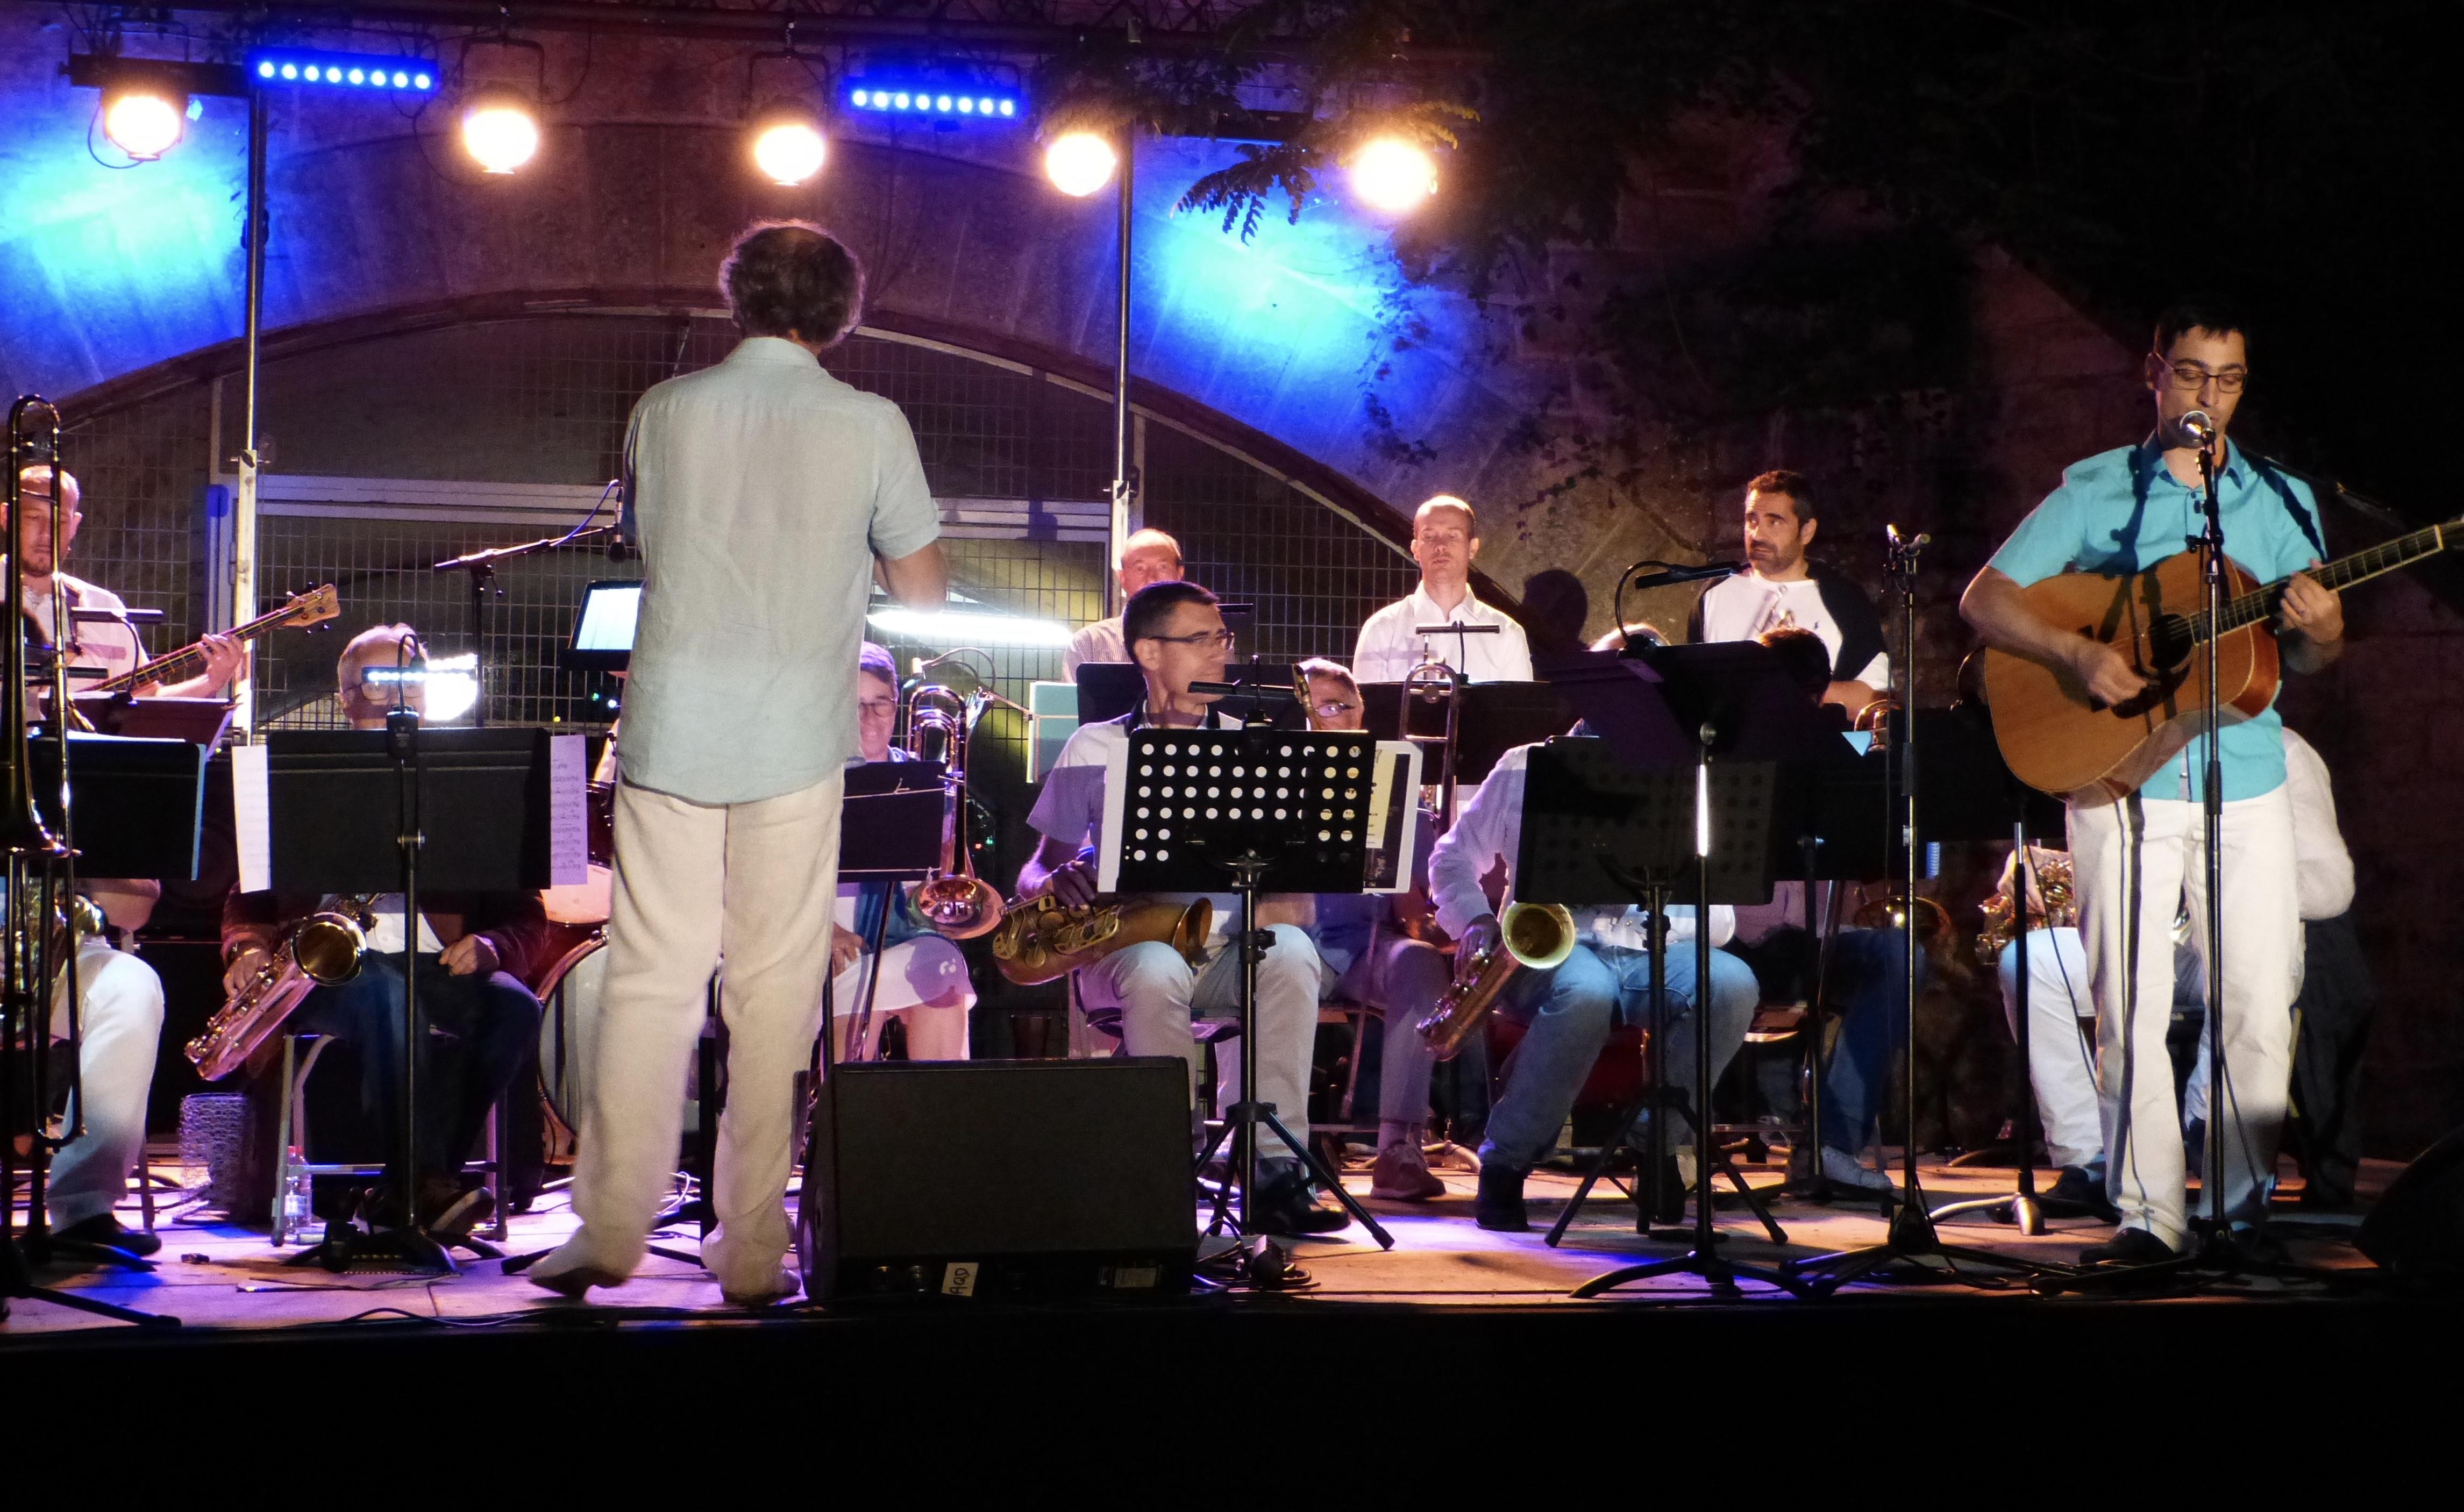 12_Concert Jazz_24_M Hare 4